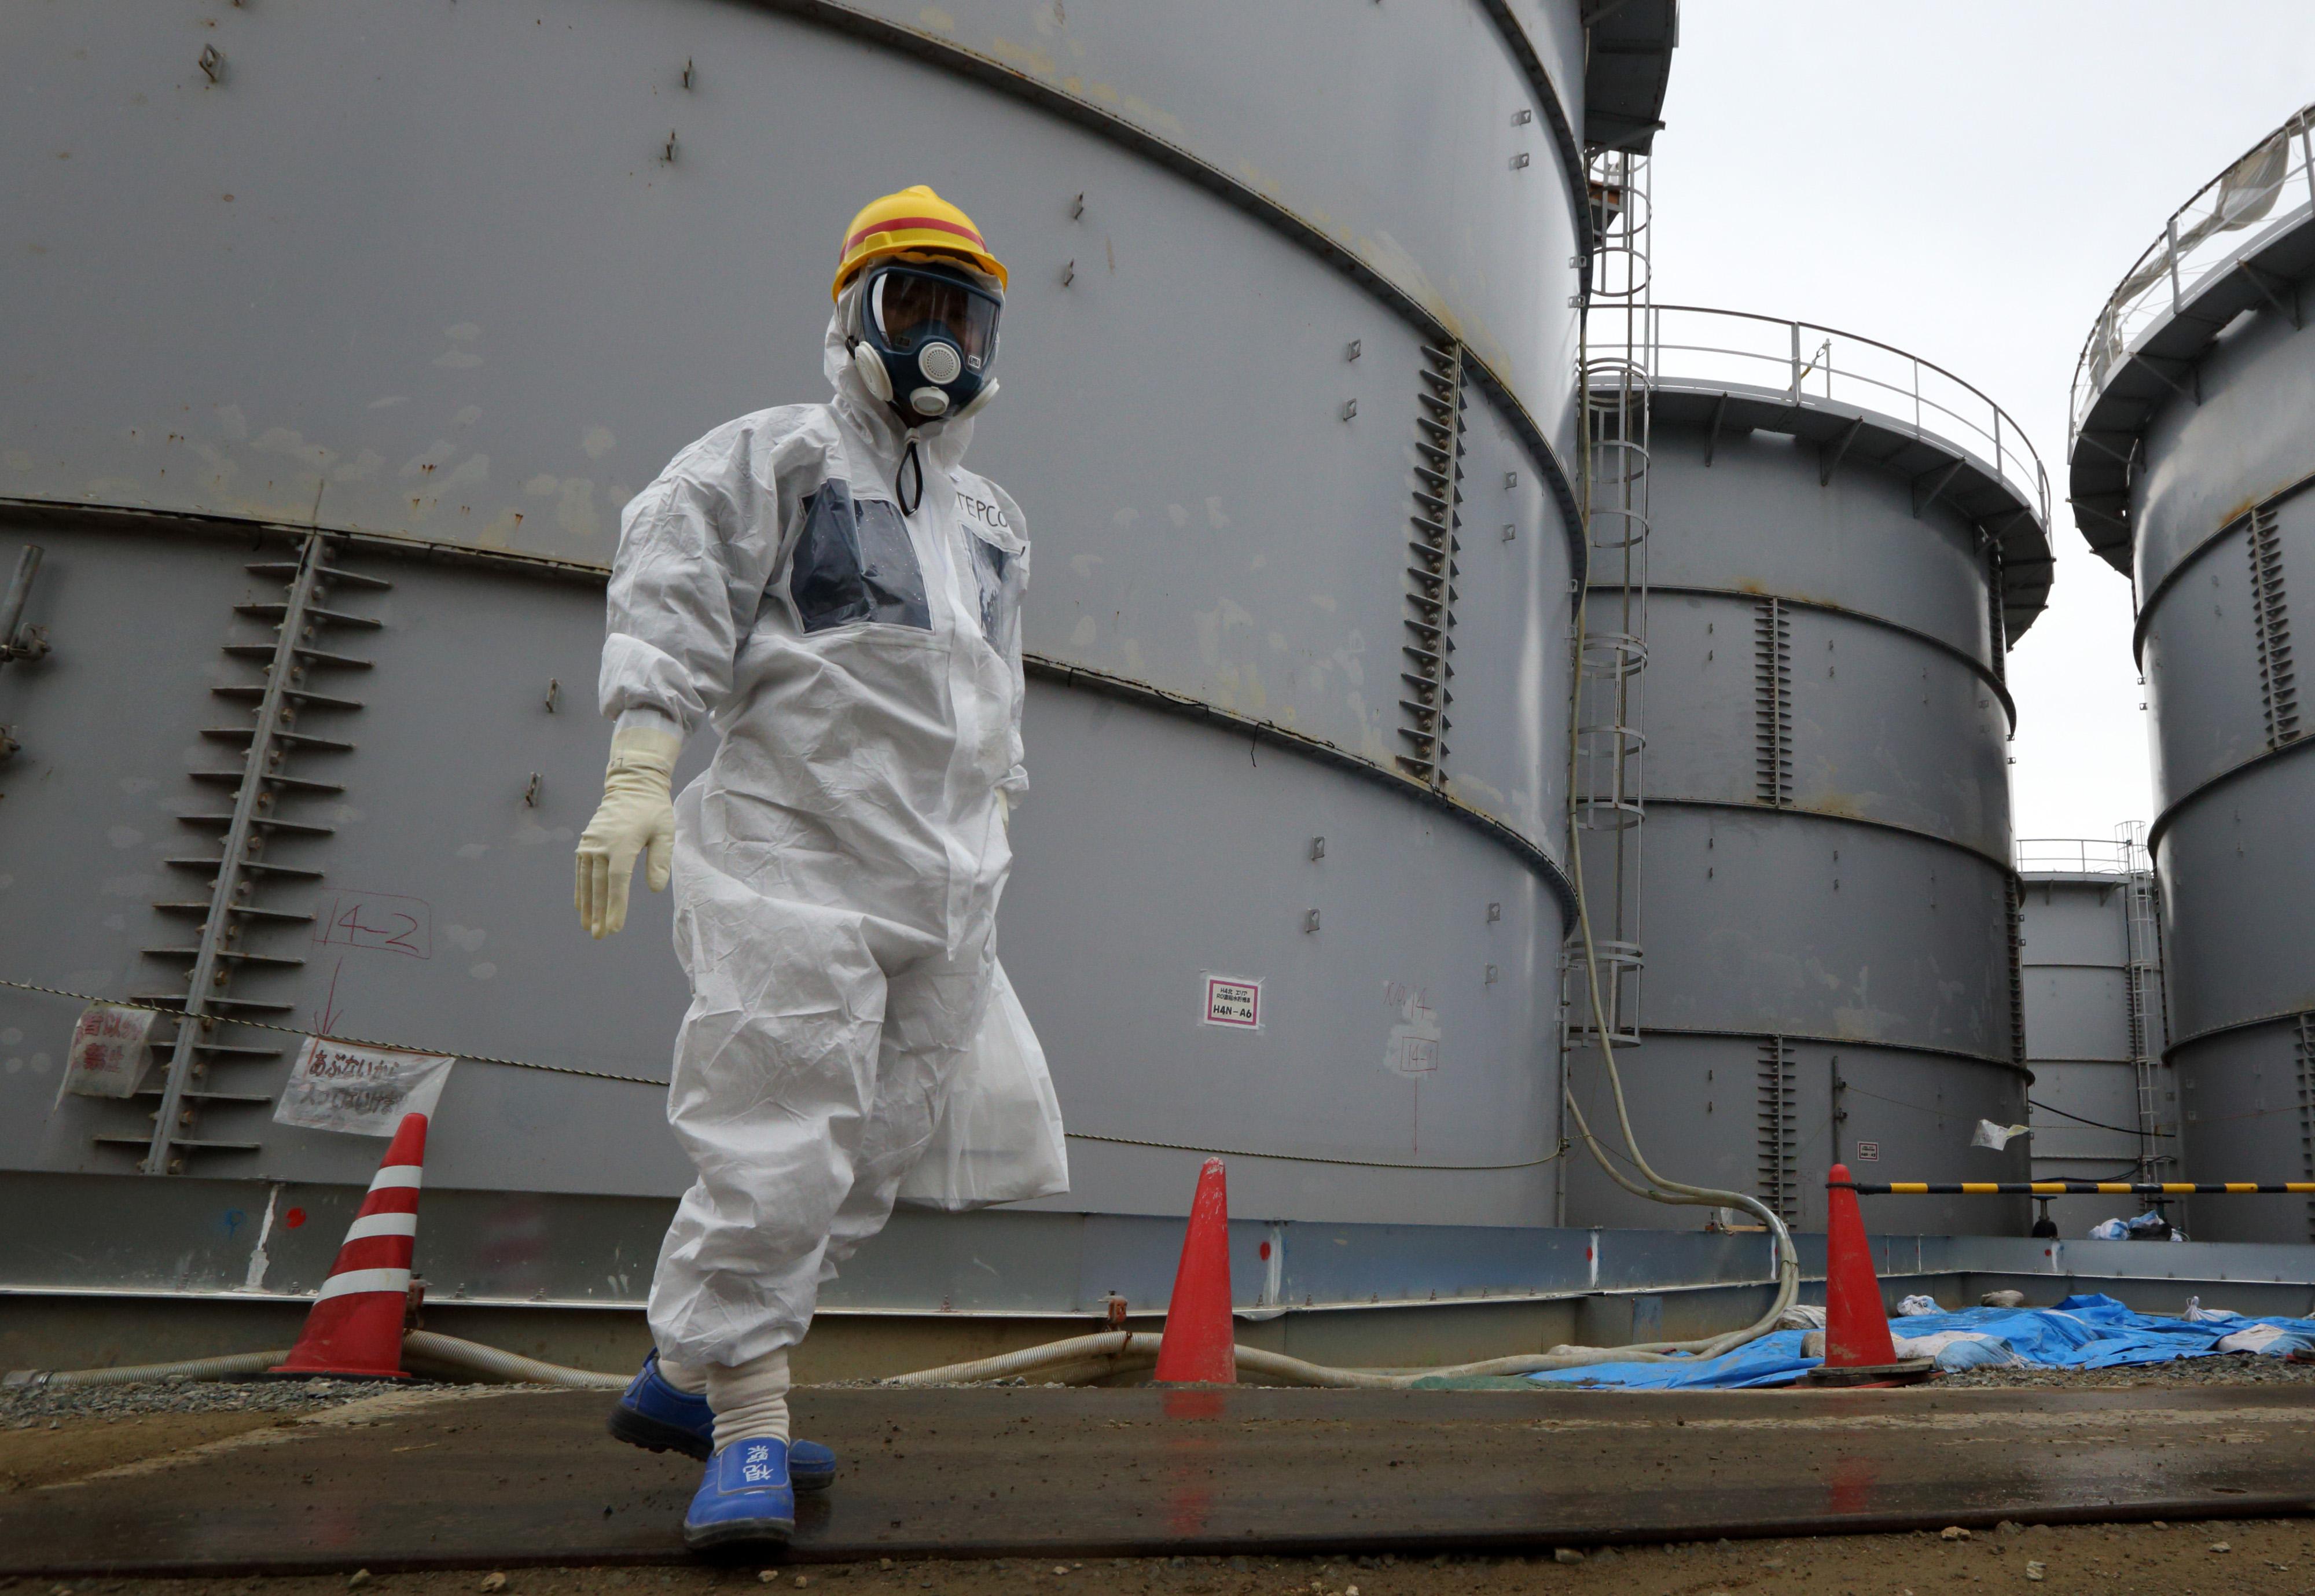 A Japanese power company employee walks past storage tanks for radioactive water at the Fukushima Daiichi plant Japan, in Nov., 2013.